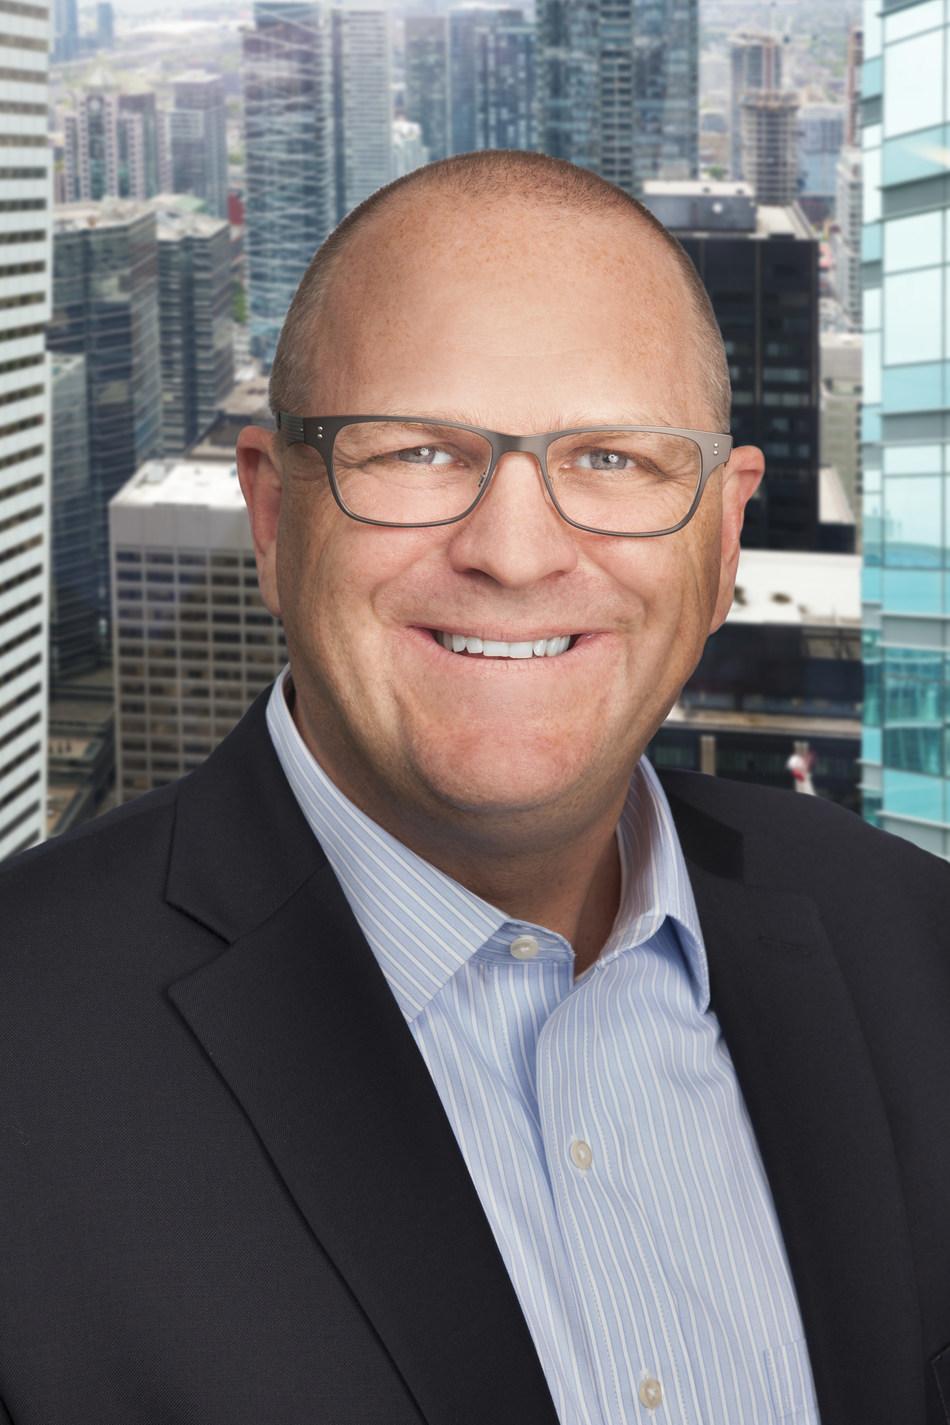 David J. Brown, KPMG Advisory principal, Shared Services and Outsourcing Advisory global lead.